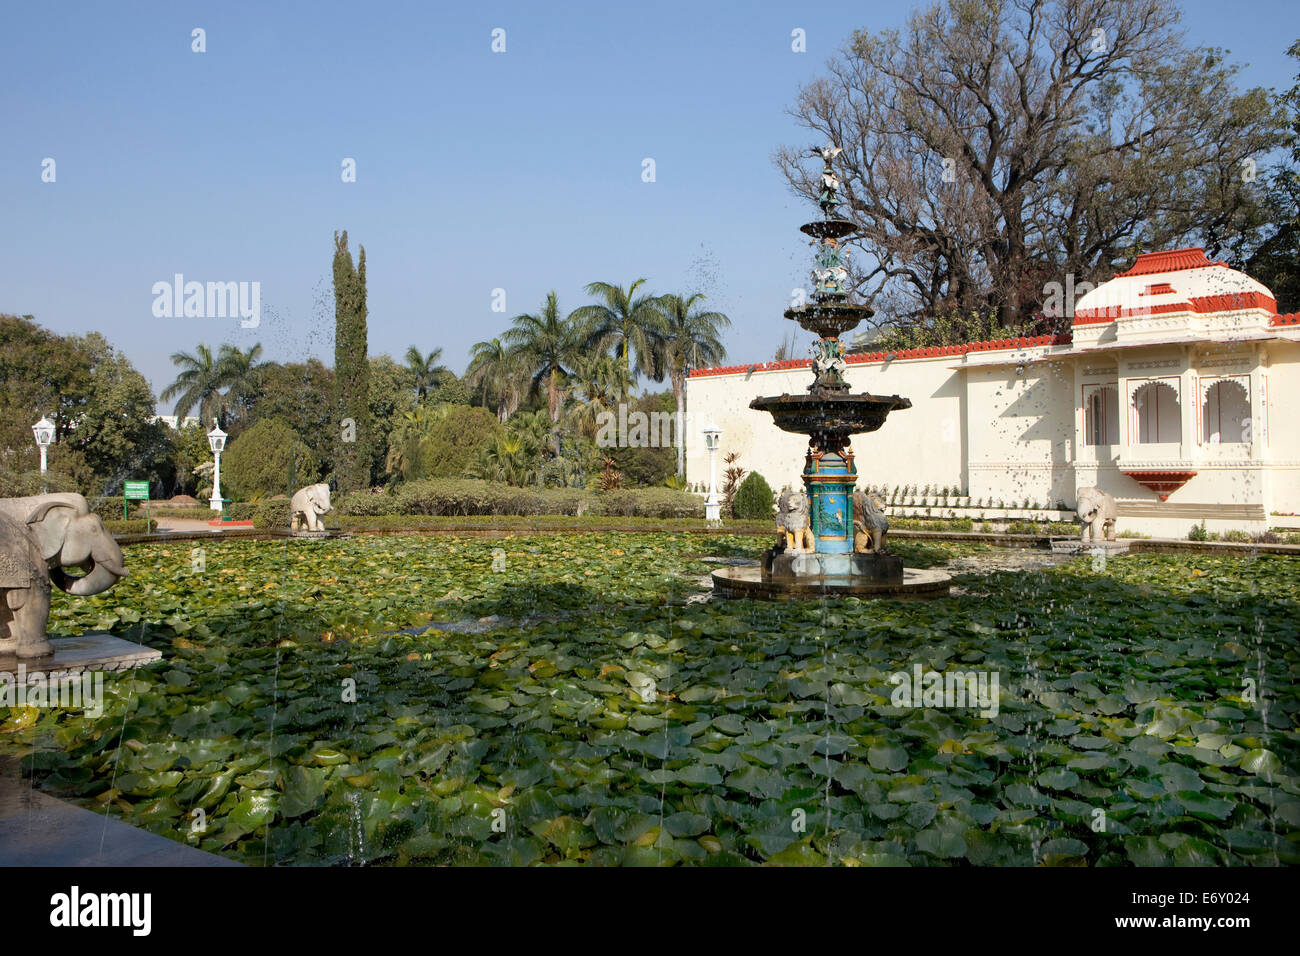 Lotus Pond In The Garden Of Saheliyon Ki Bari, Udaipur, Rajasthan, India